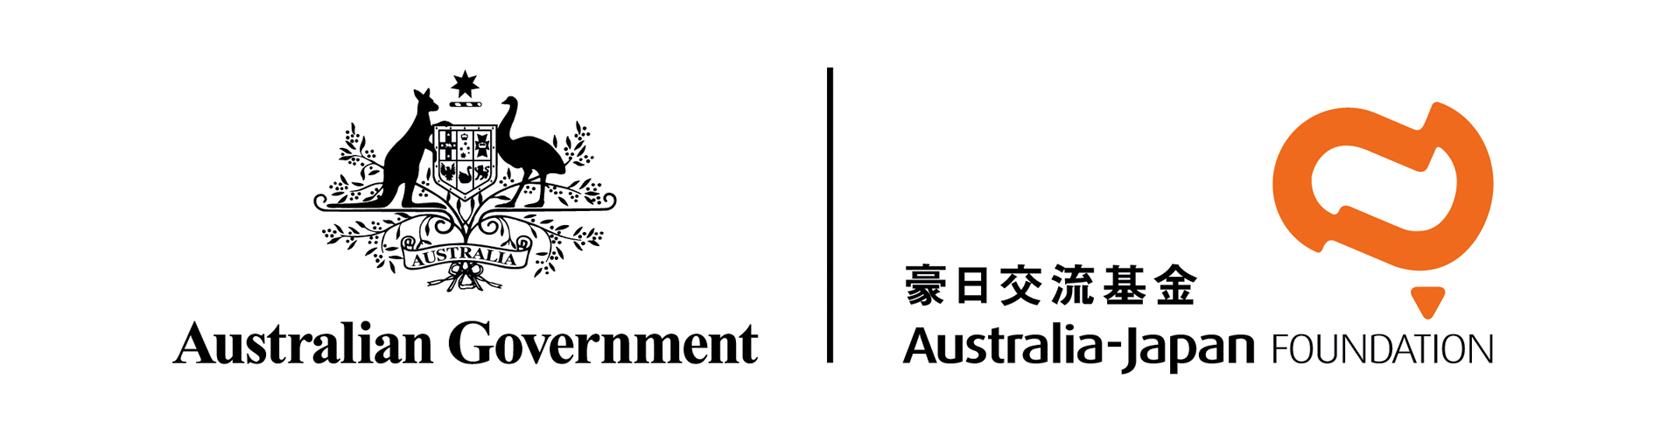 Australia-Japan Foundation